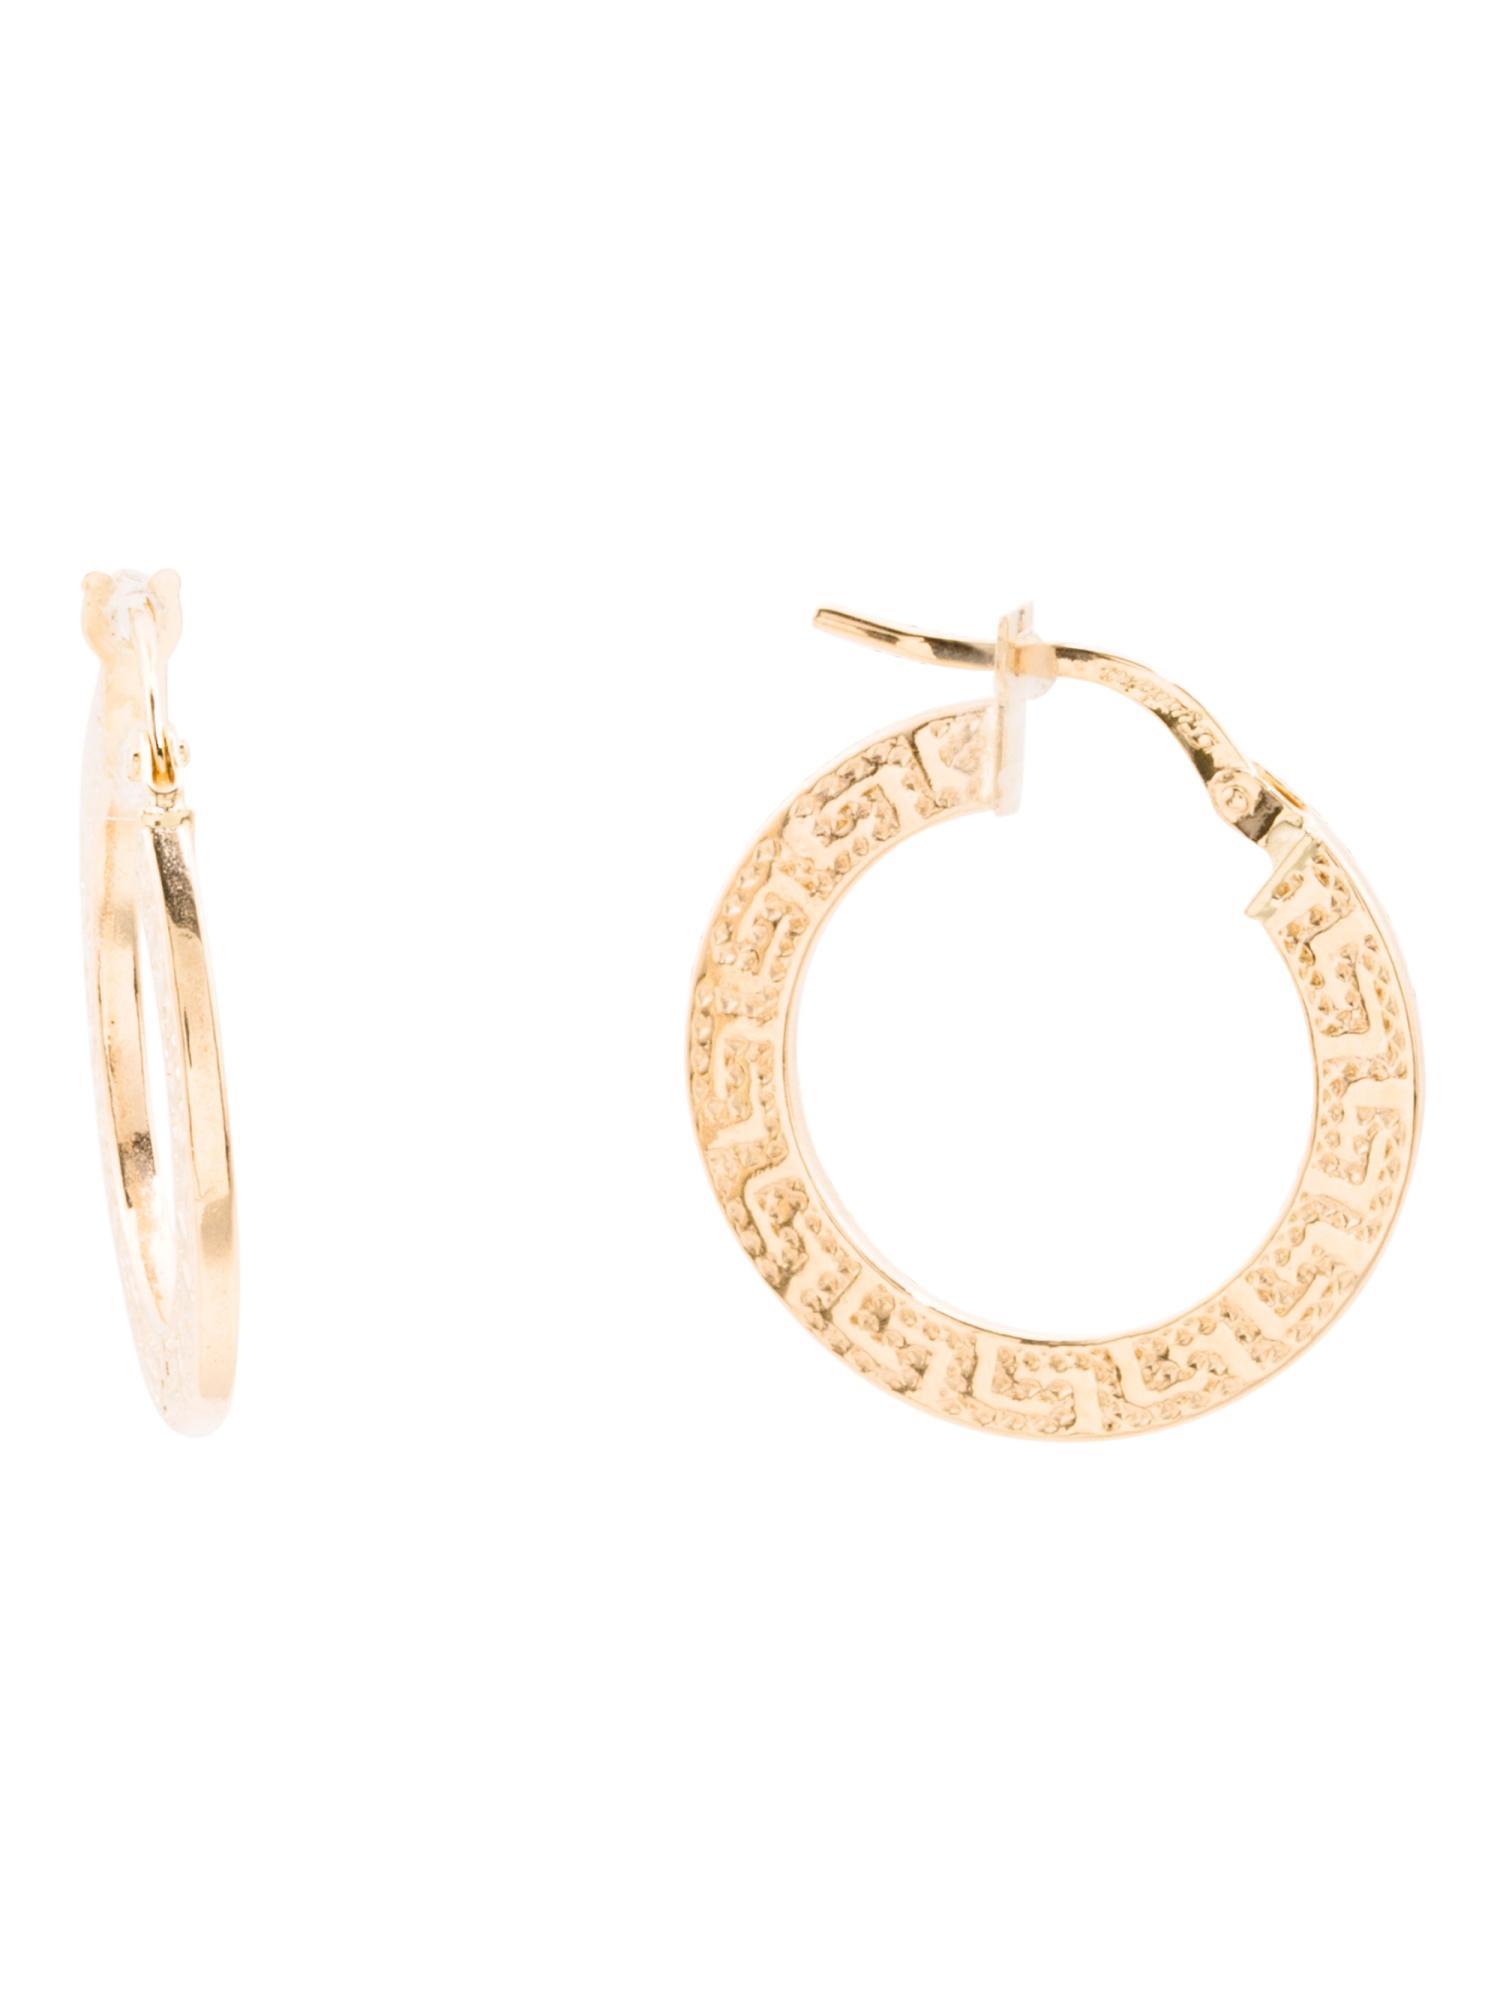 14k Tri-Color Gold Dangle Heart Post Earrings, 20mm X 15mm